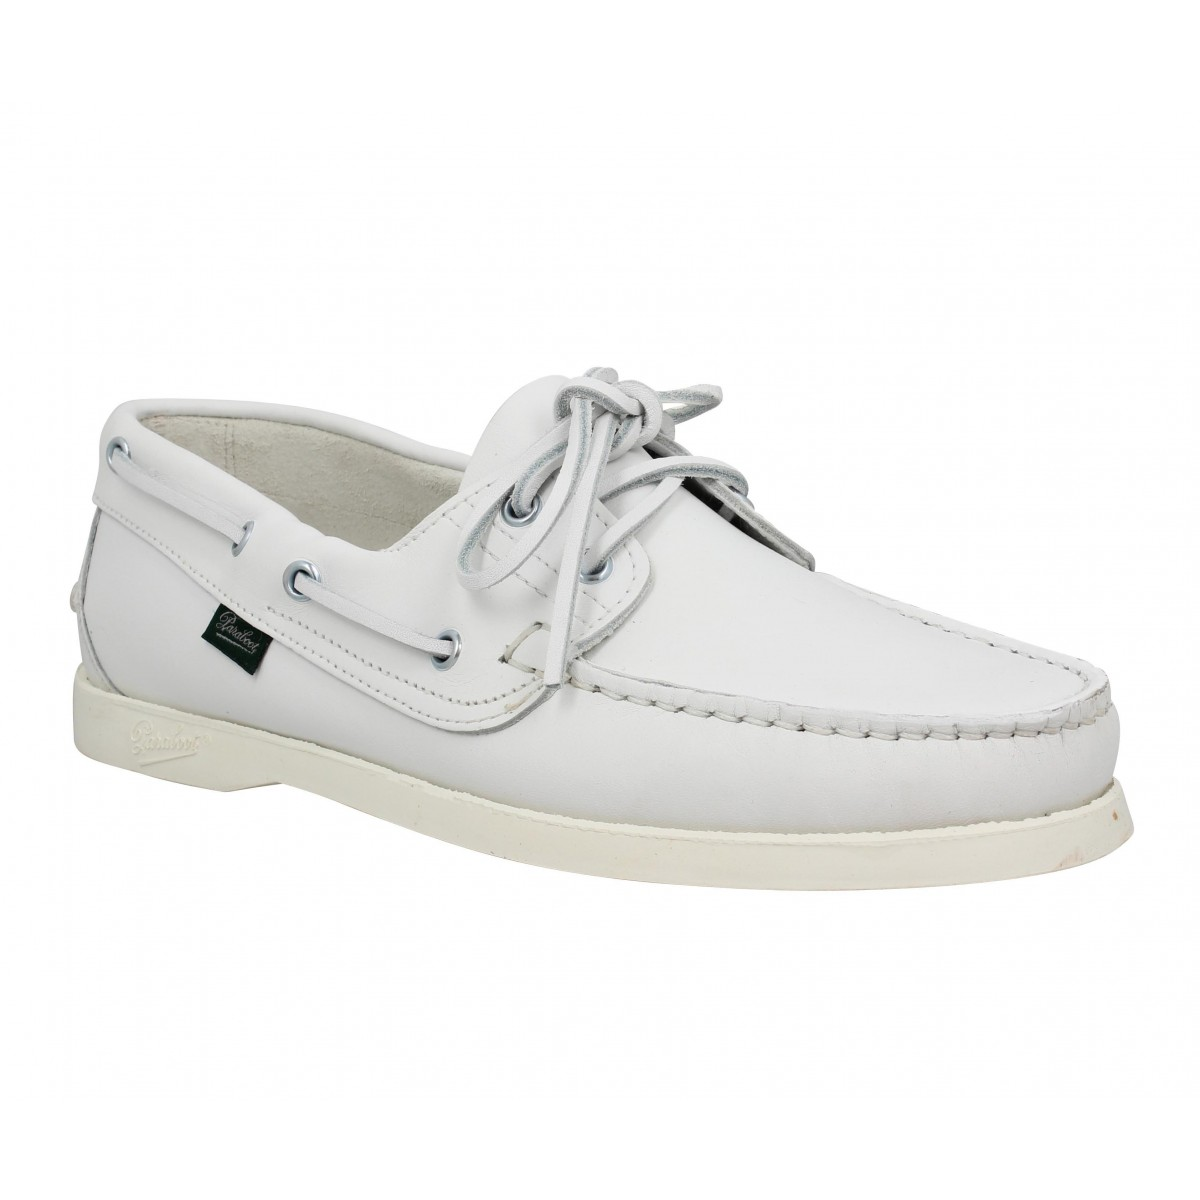 Chaussures bateaux PARABOOT Barth cuir Homme Blanc